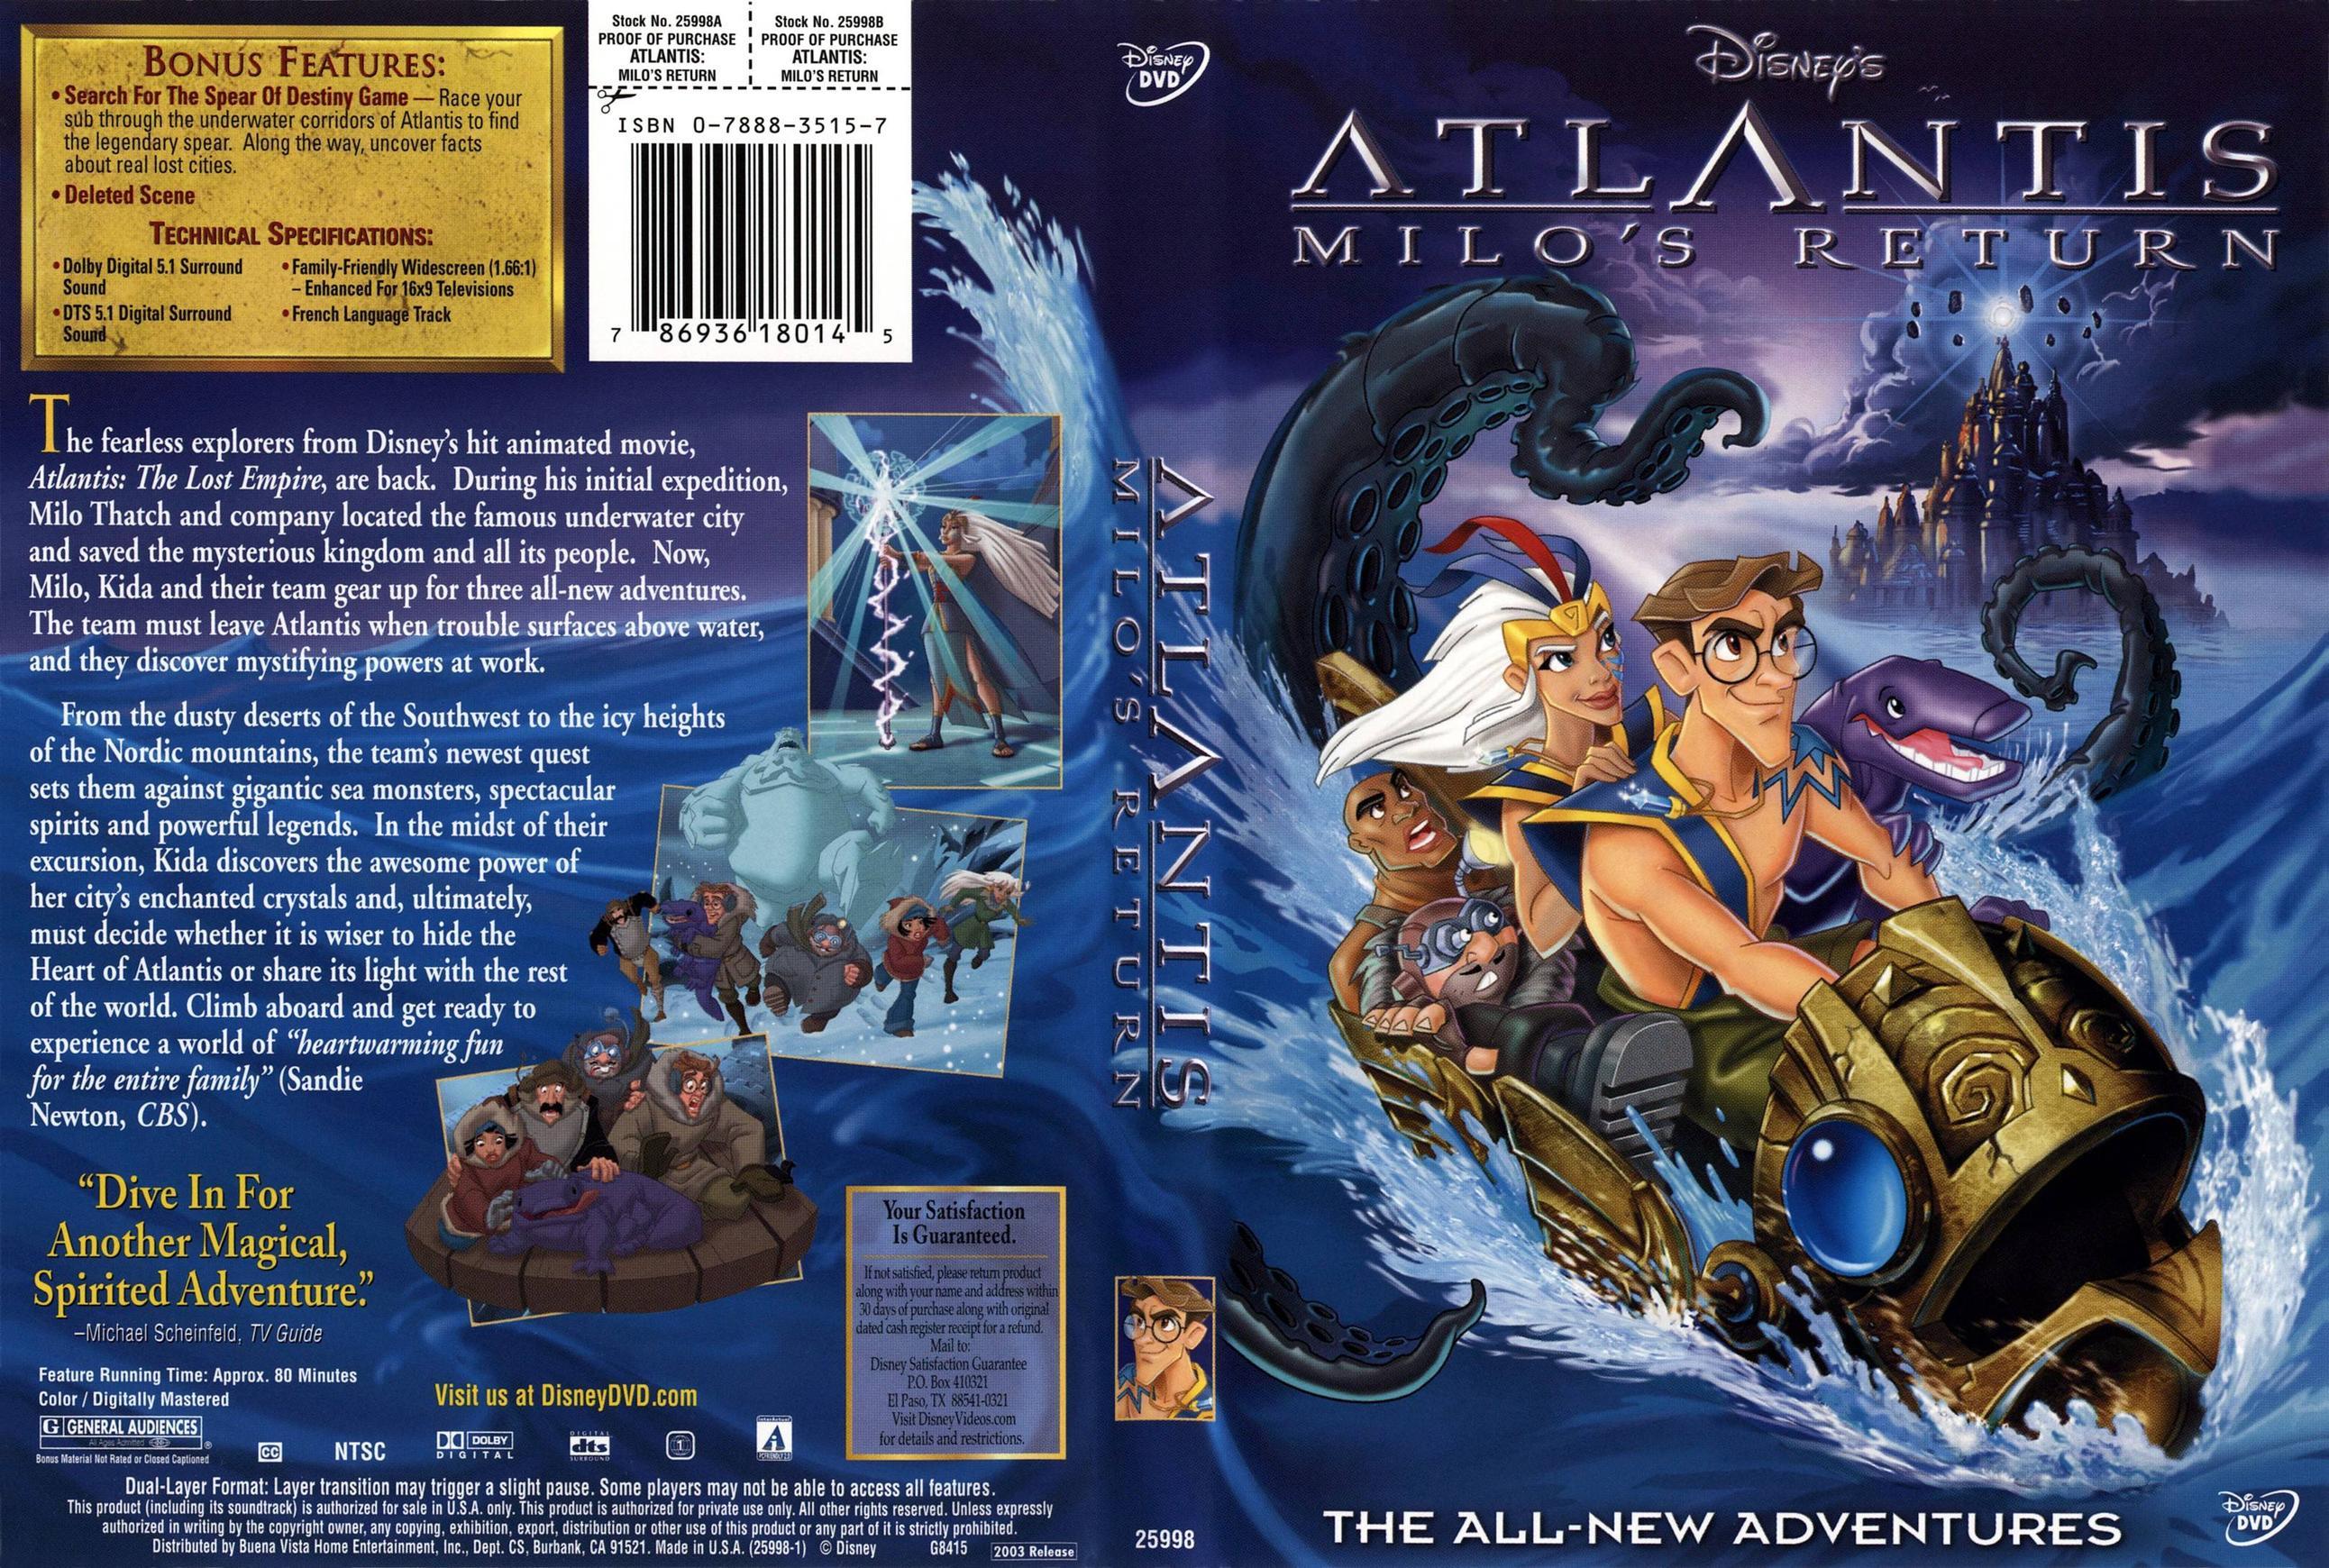 Nice wallpapers Atlantis: Milo's Return 2584x1740px